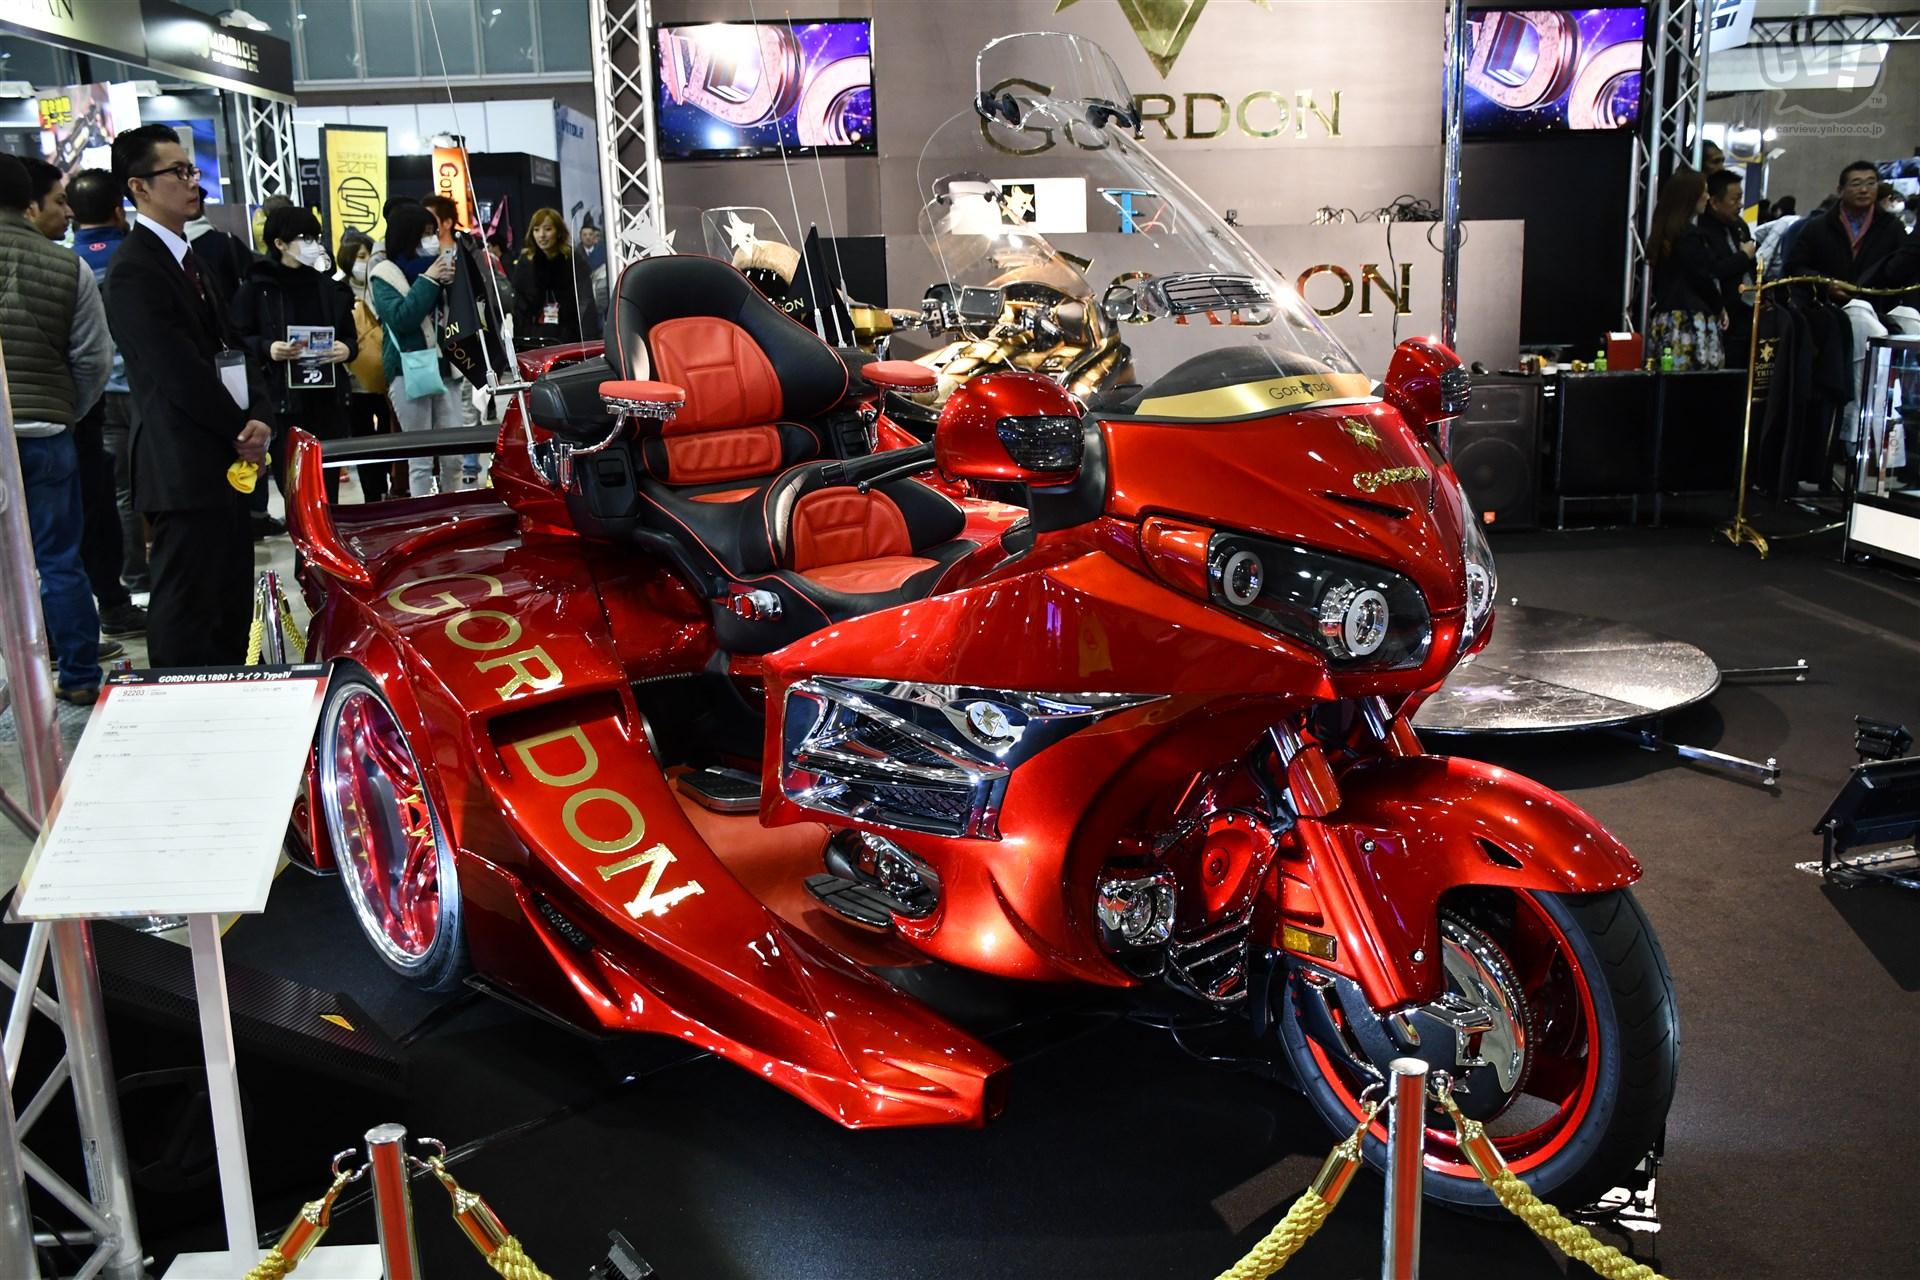 GORDON ホンダ GL1800 トライク